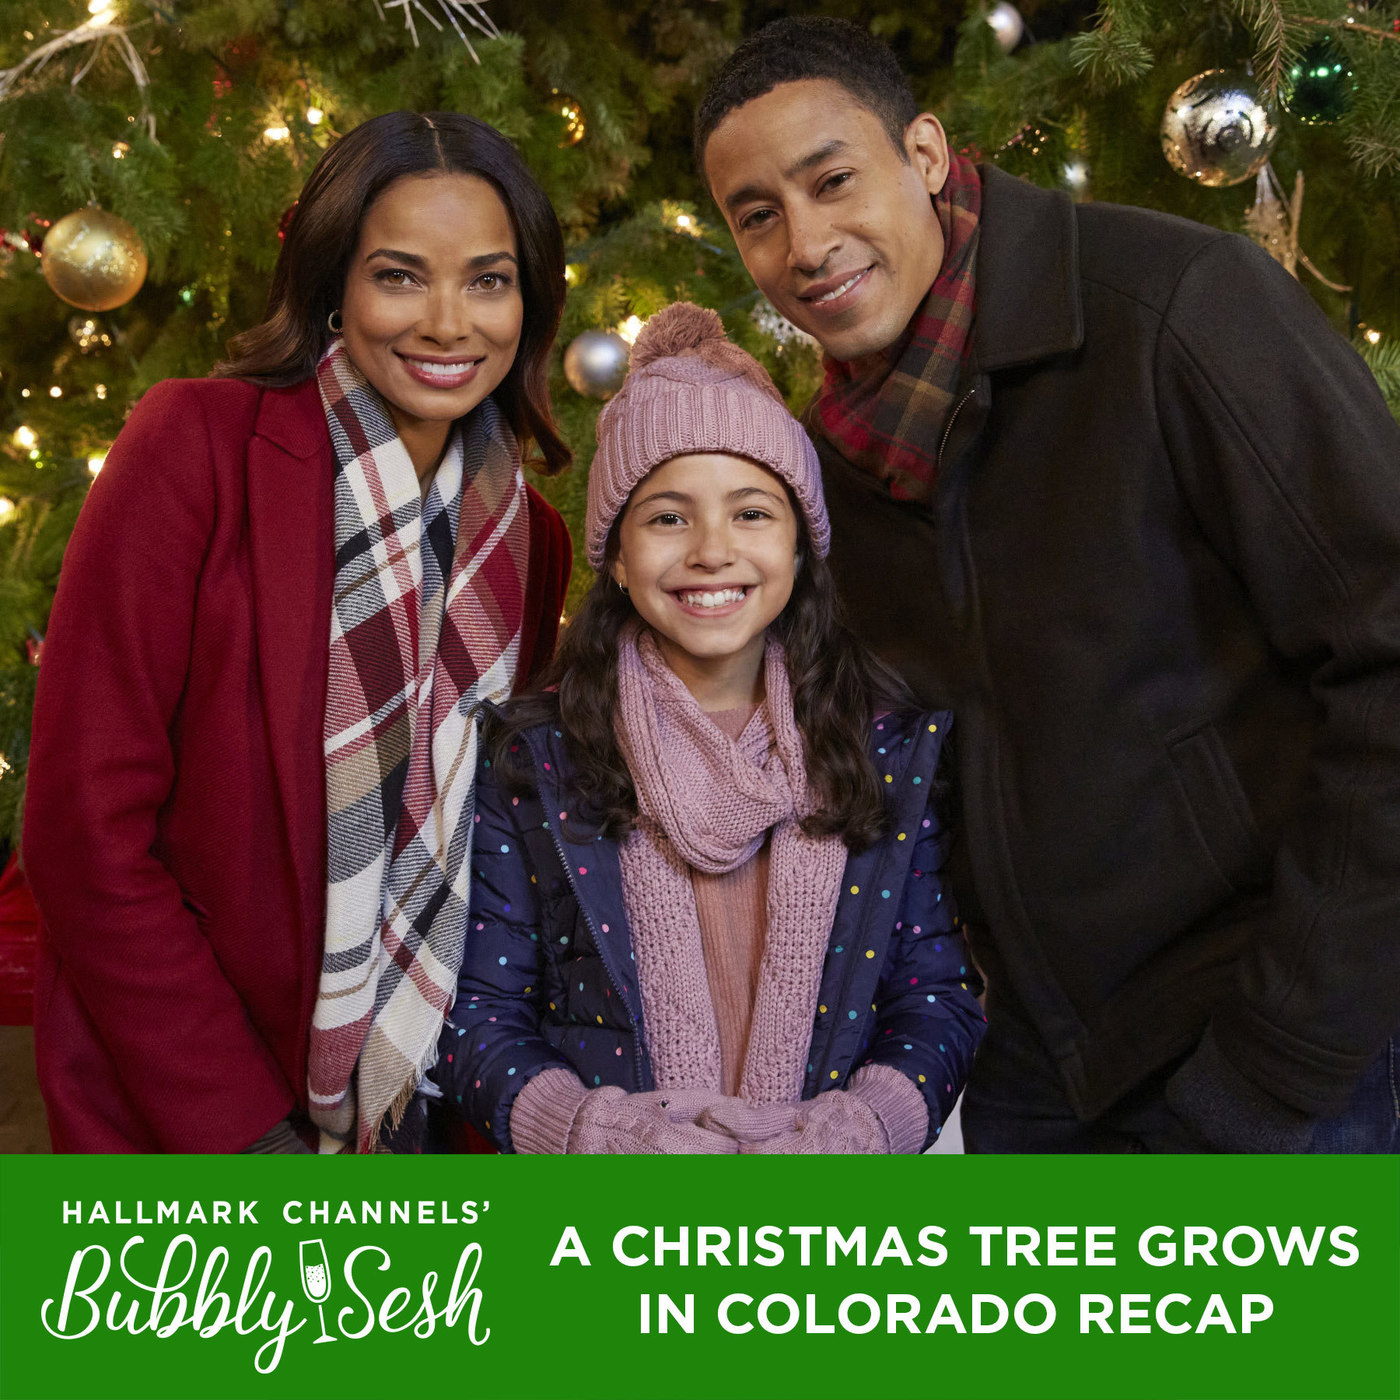 A Christmas Tree Grows in Colorado Recap